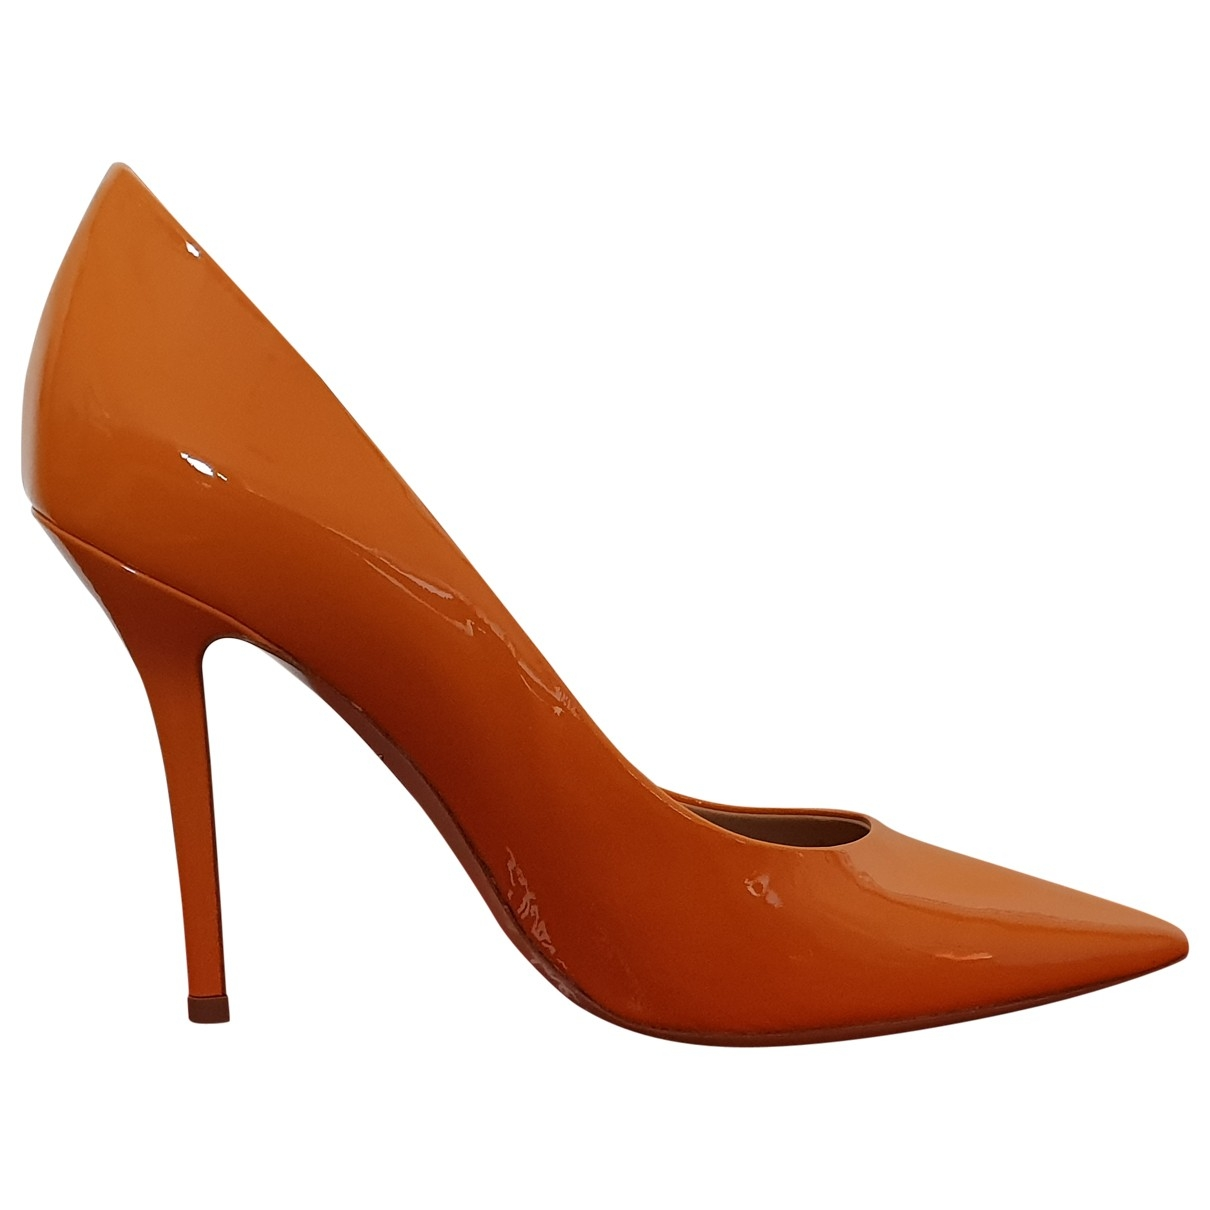 Salvatore Ferragamo \N Orange Patent leather Heels for Women 38.5 EU